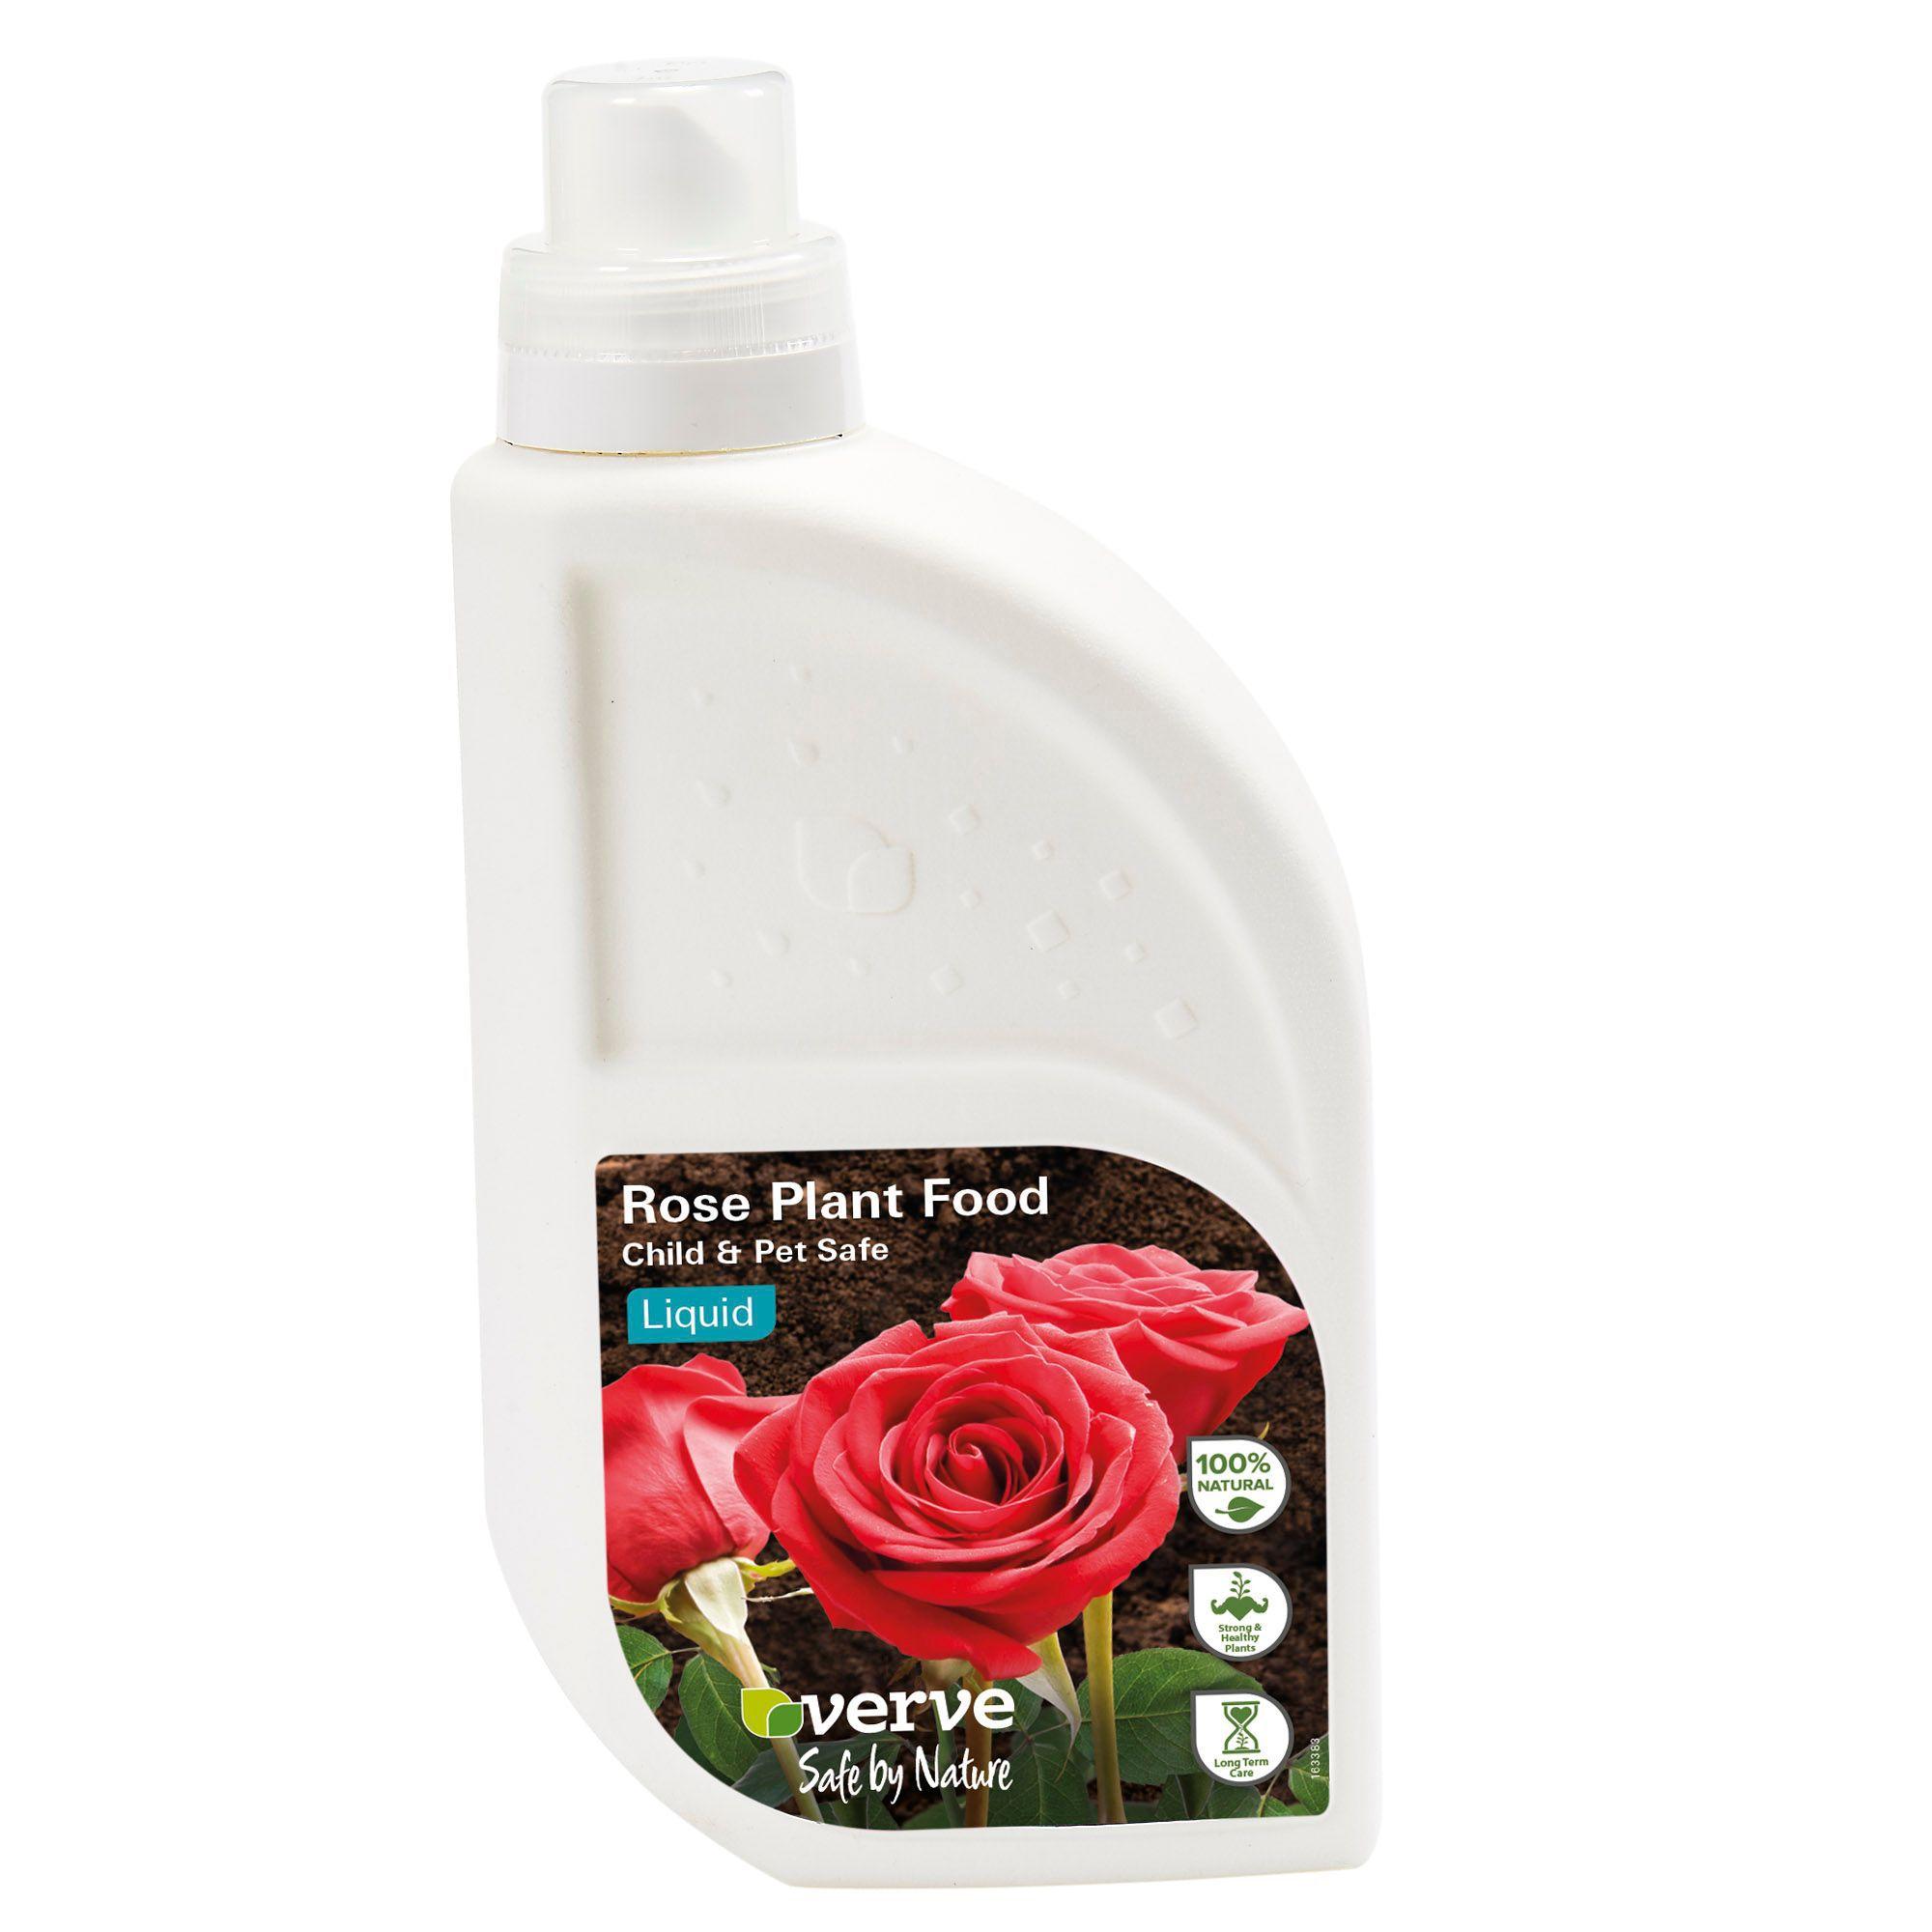 Verve rose plant food liquid 1l departments diy at b q for Diy rose food